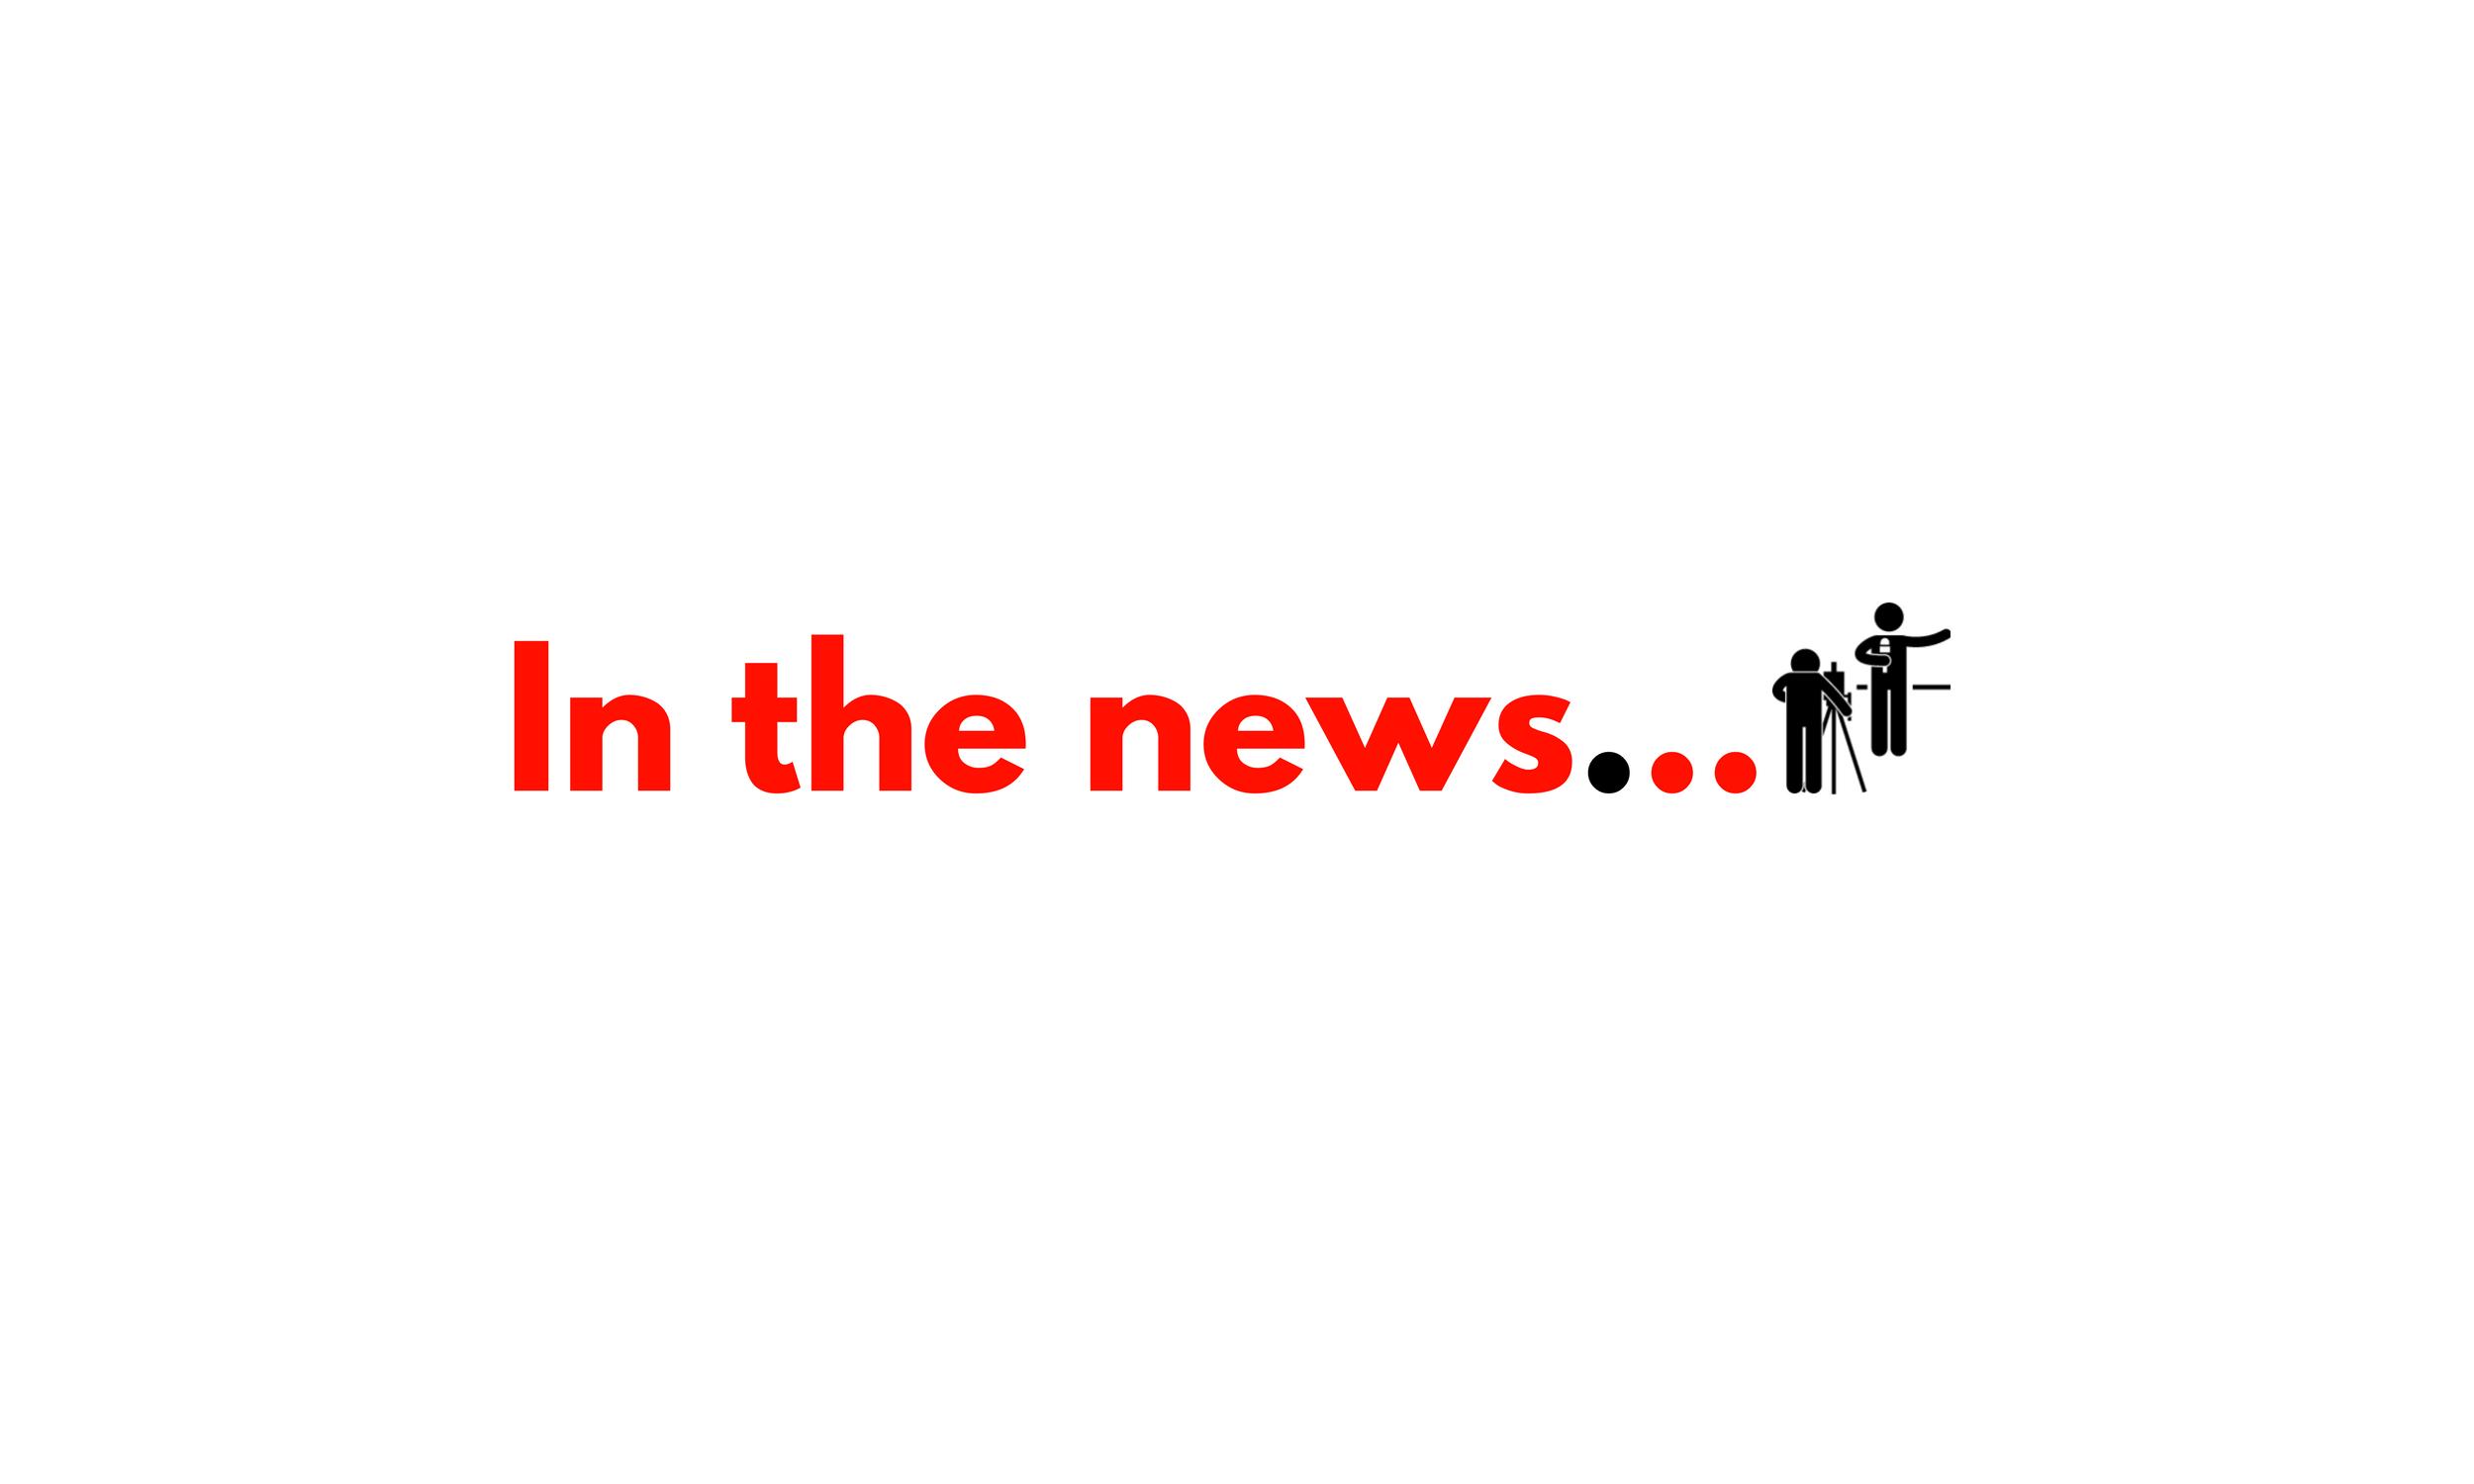 in-the-news-media-evans-construction-company-sandston-richmond-virginia-best-general-contractors